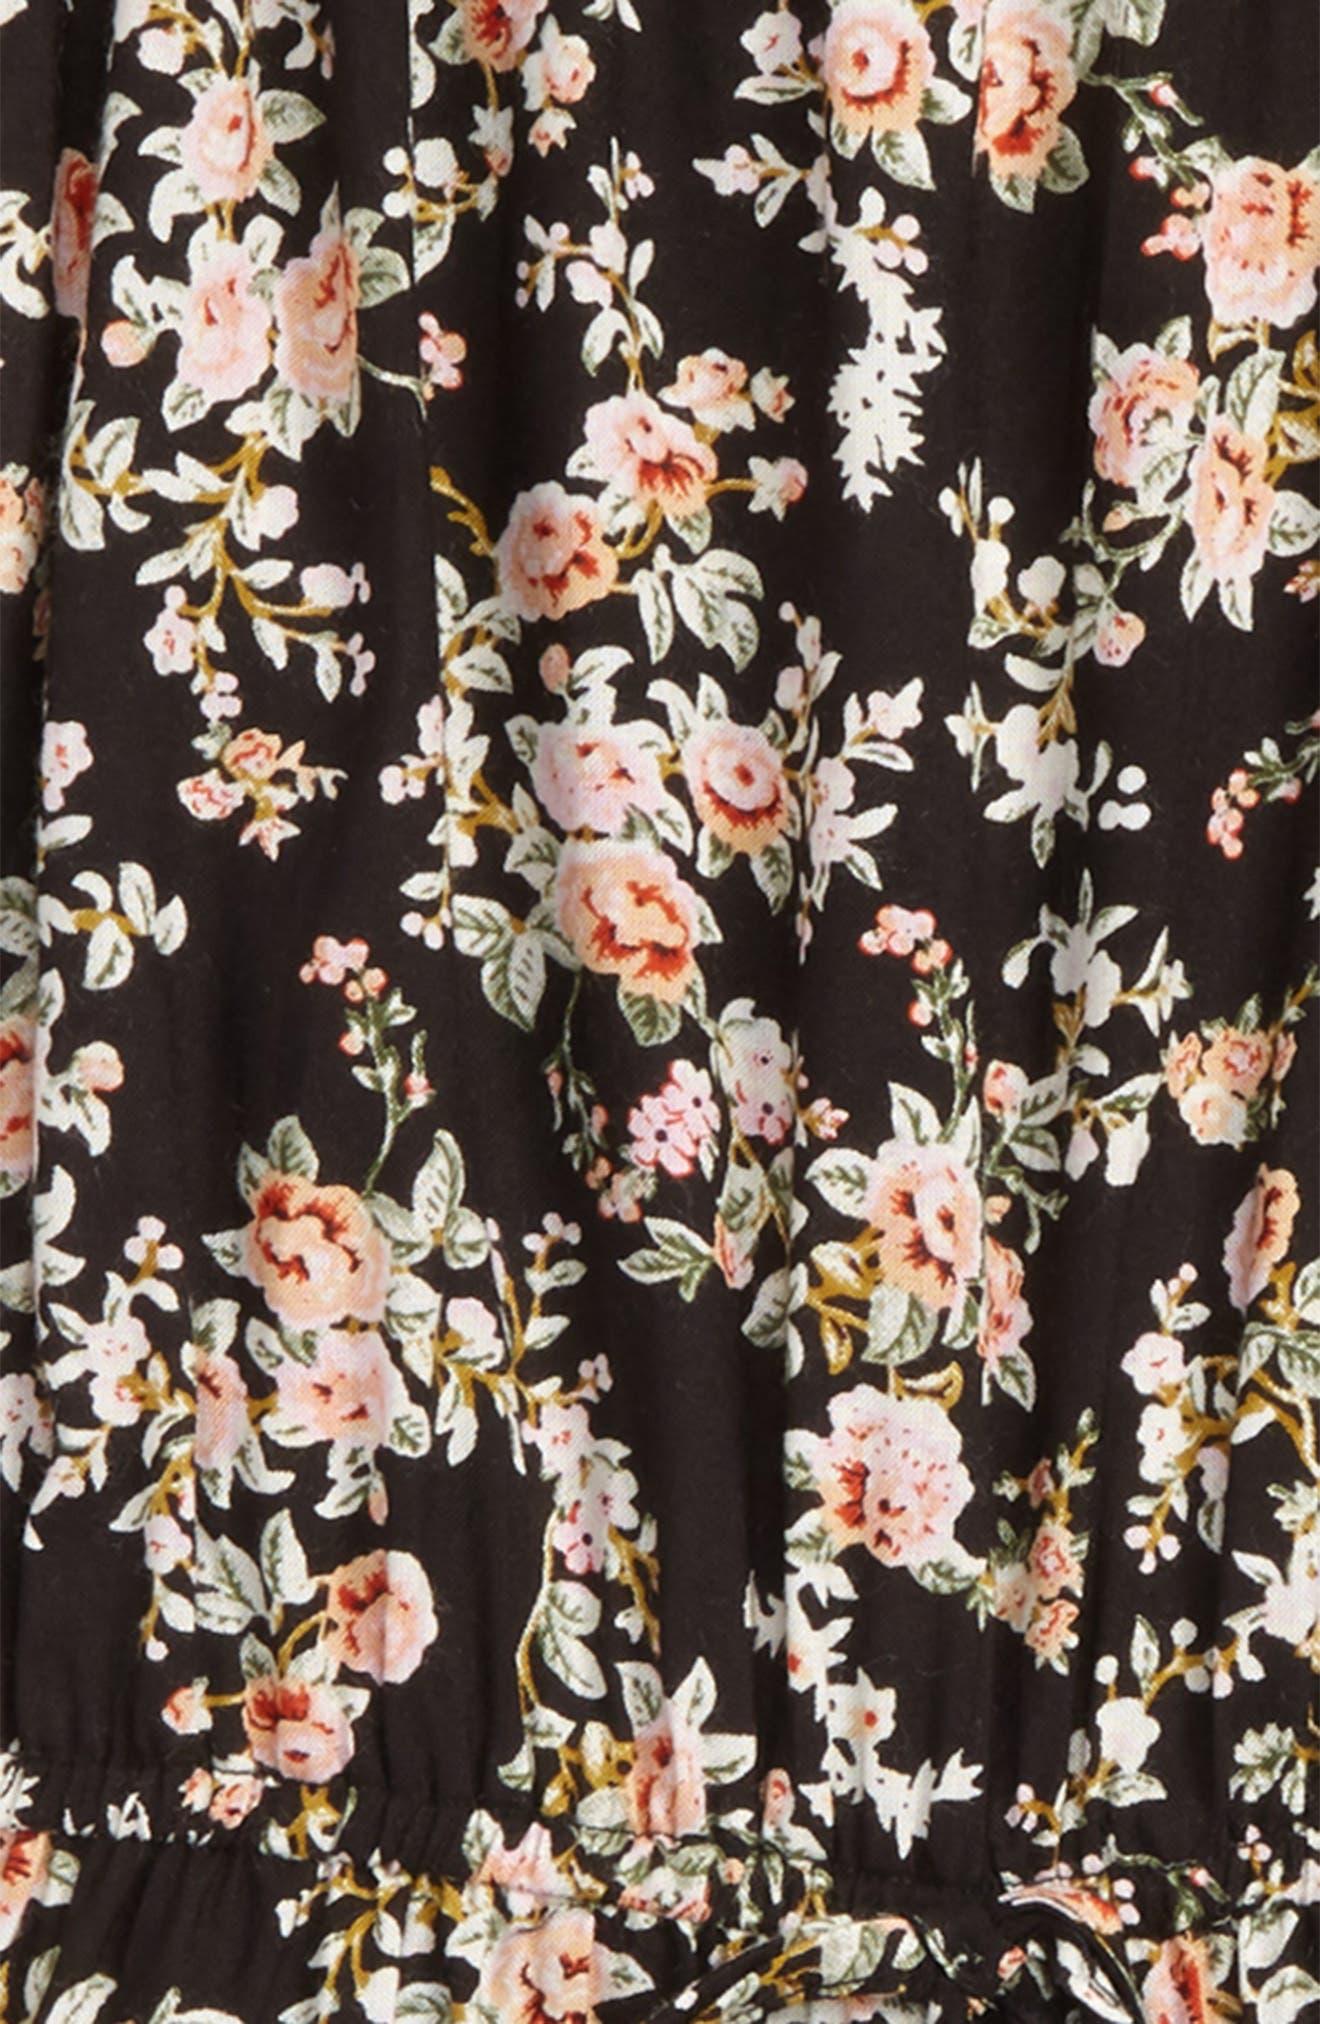 Floral Off the Shoulder Romper,                             Alternate thumbnail 2, color,                             Black/ Peach